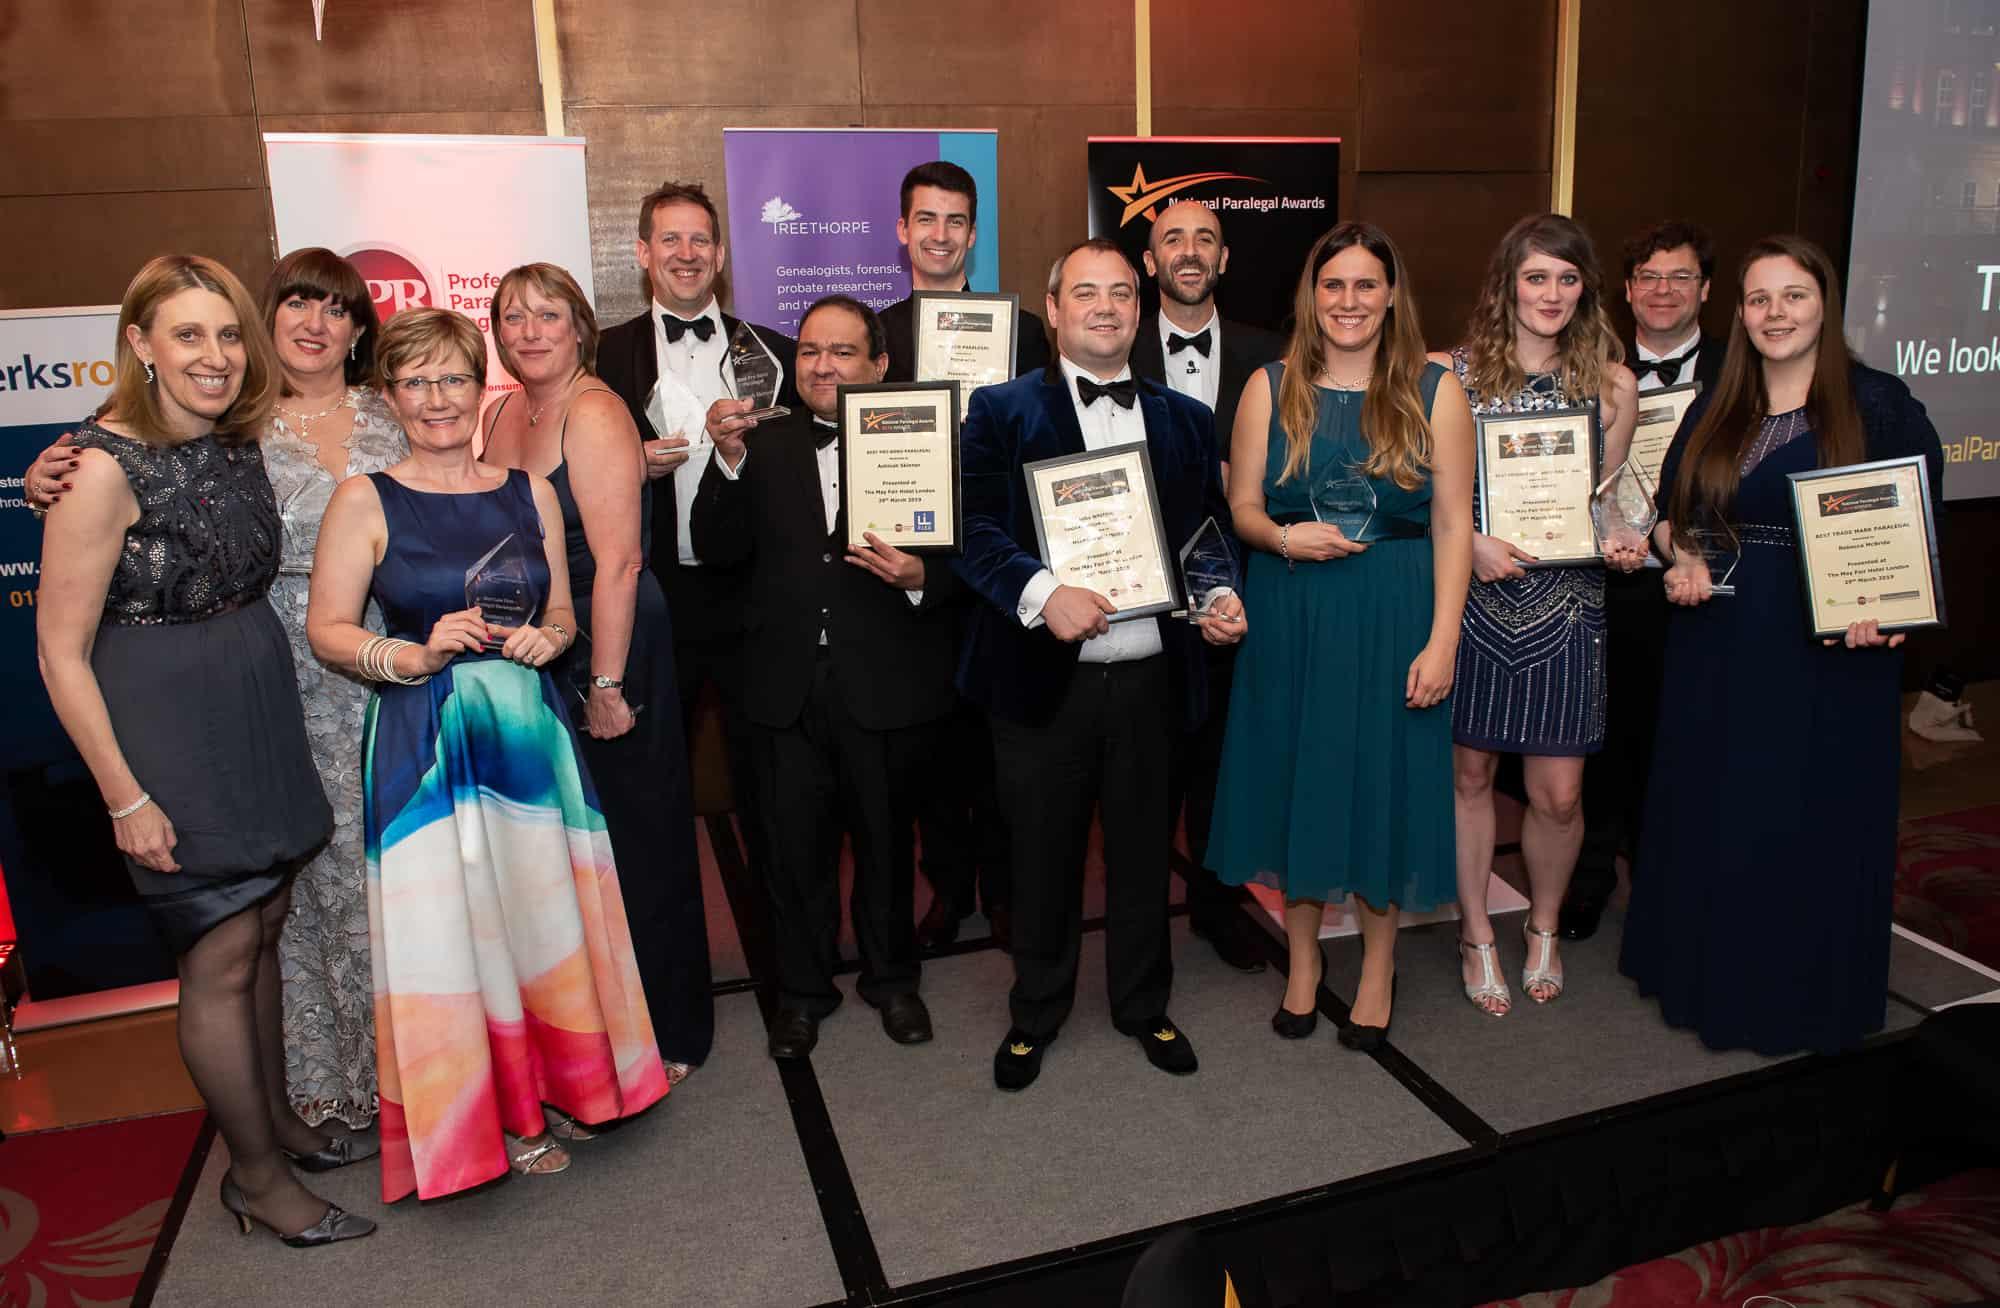 paralegal awards